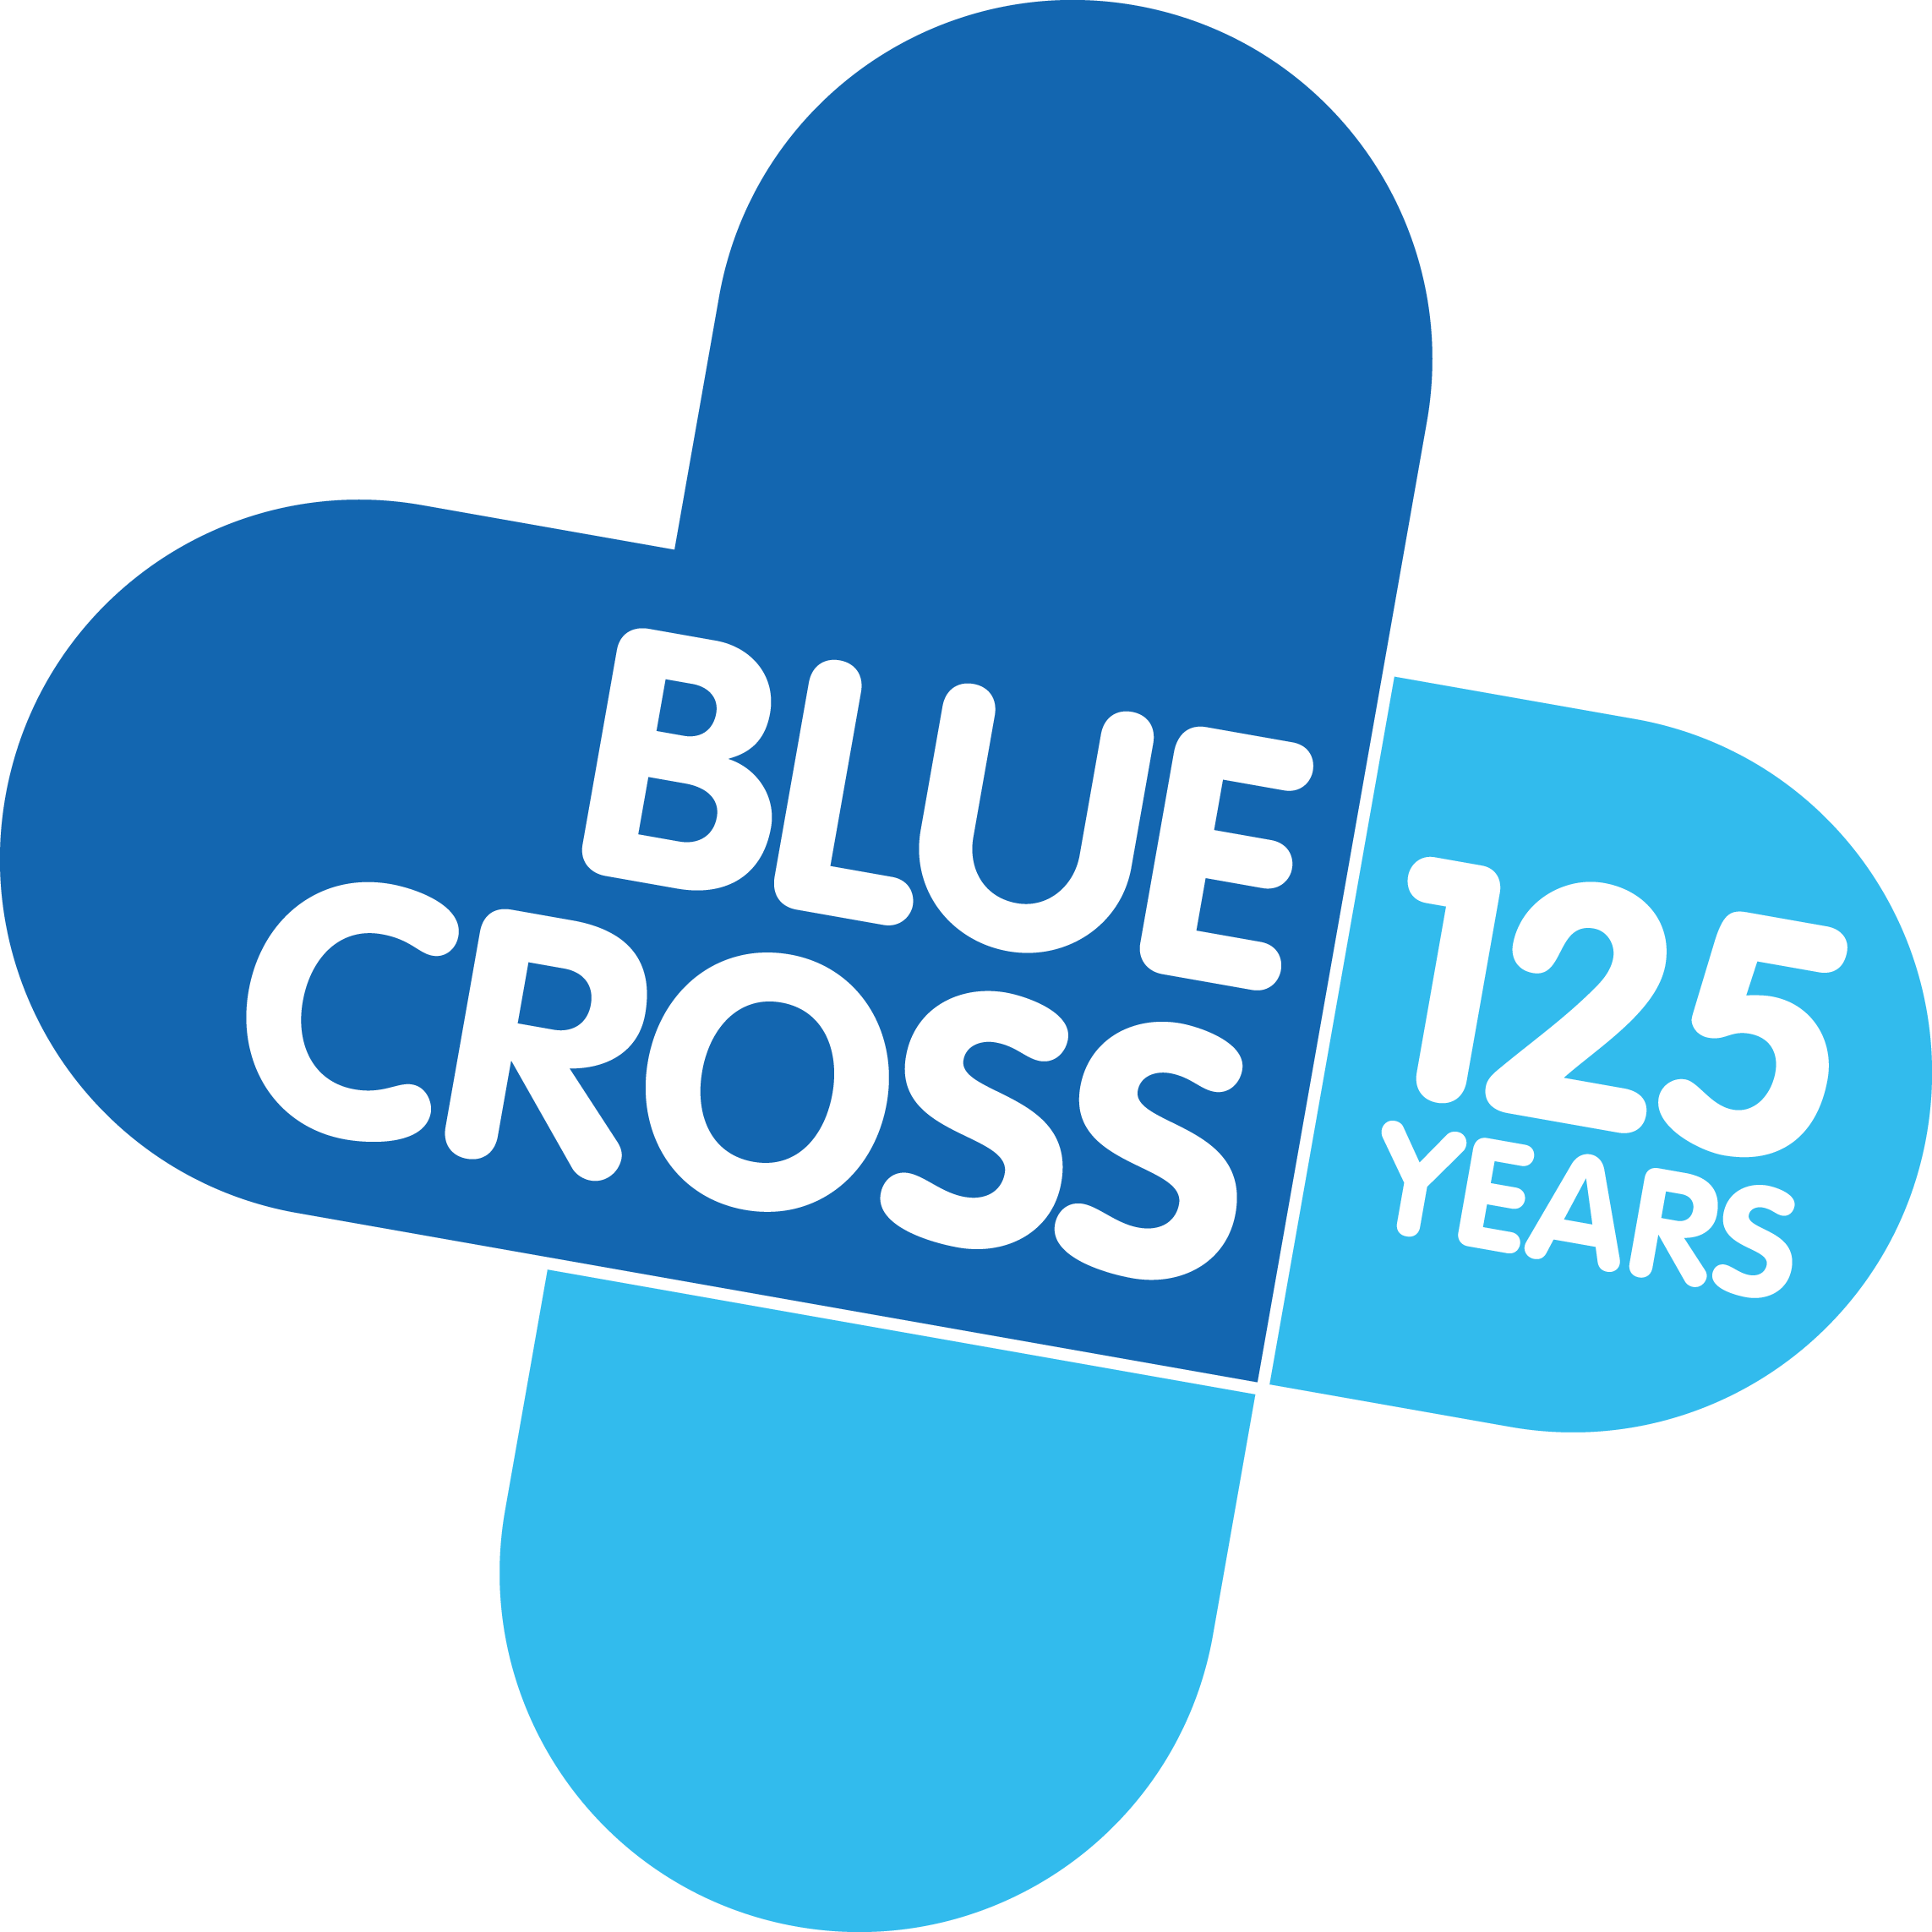 Blue Cross (animal charity) organization